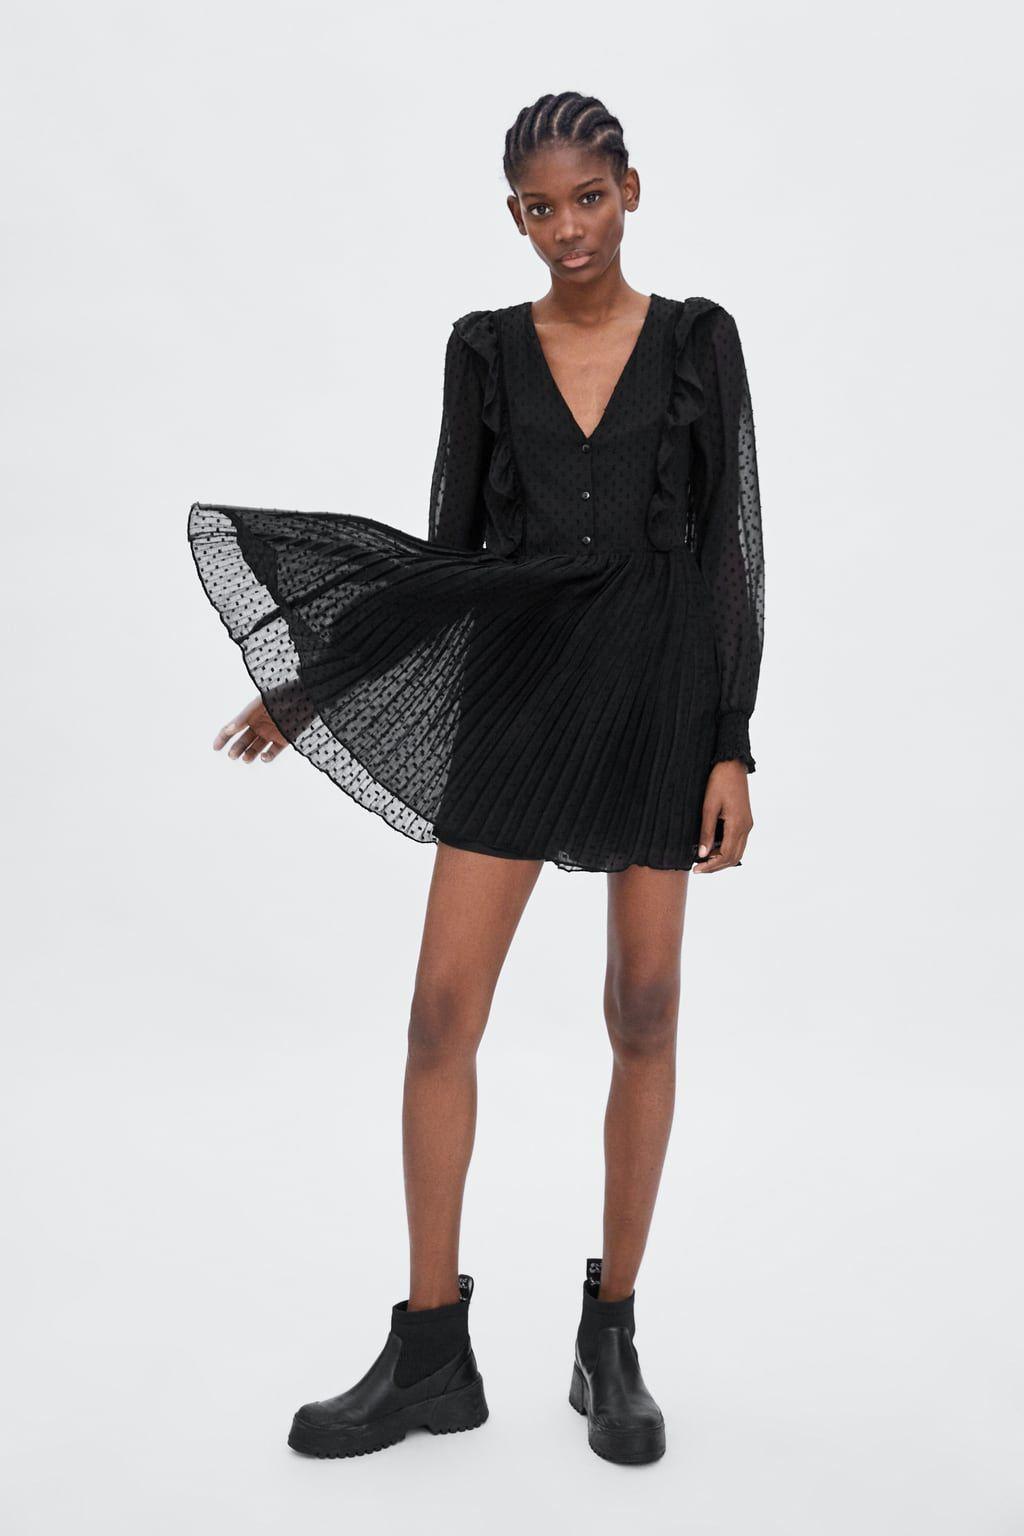 Image 1 of SWISS DOT JUMPSUIT DRESS from Zara | Jumpsuit ...